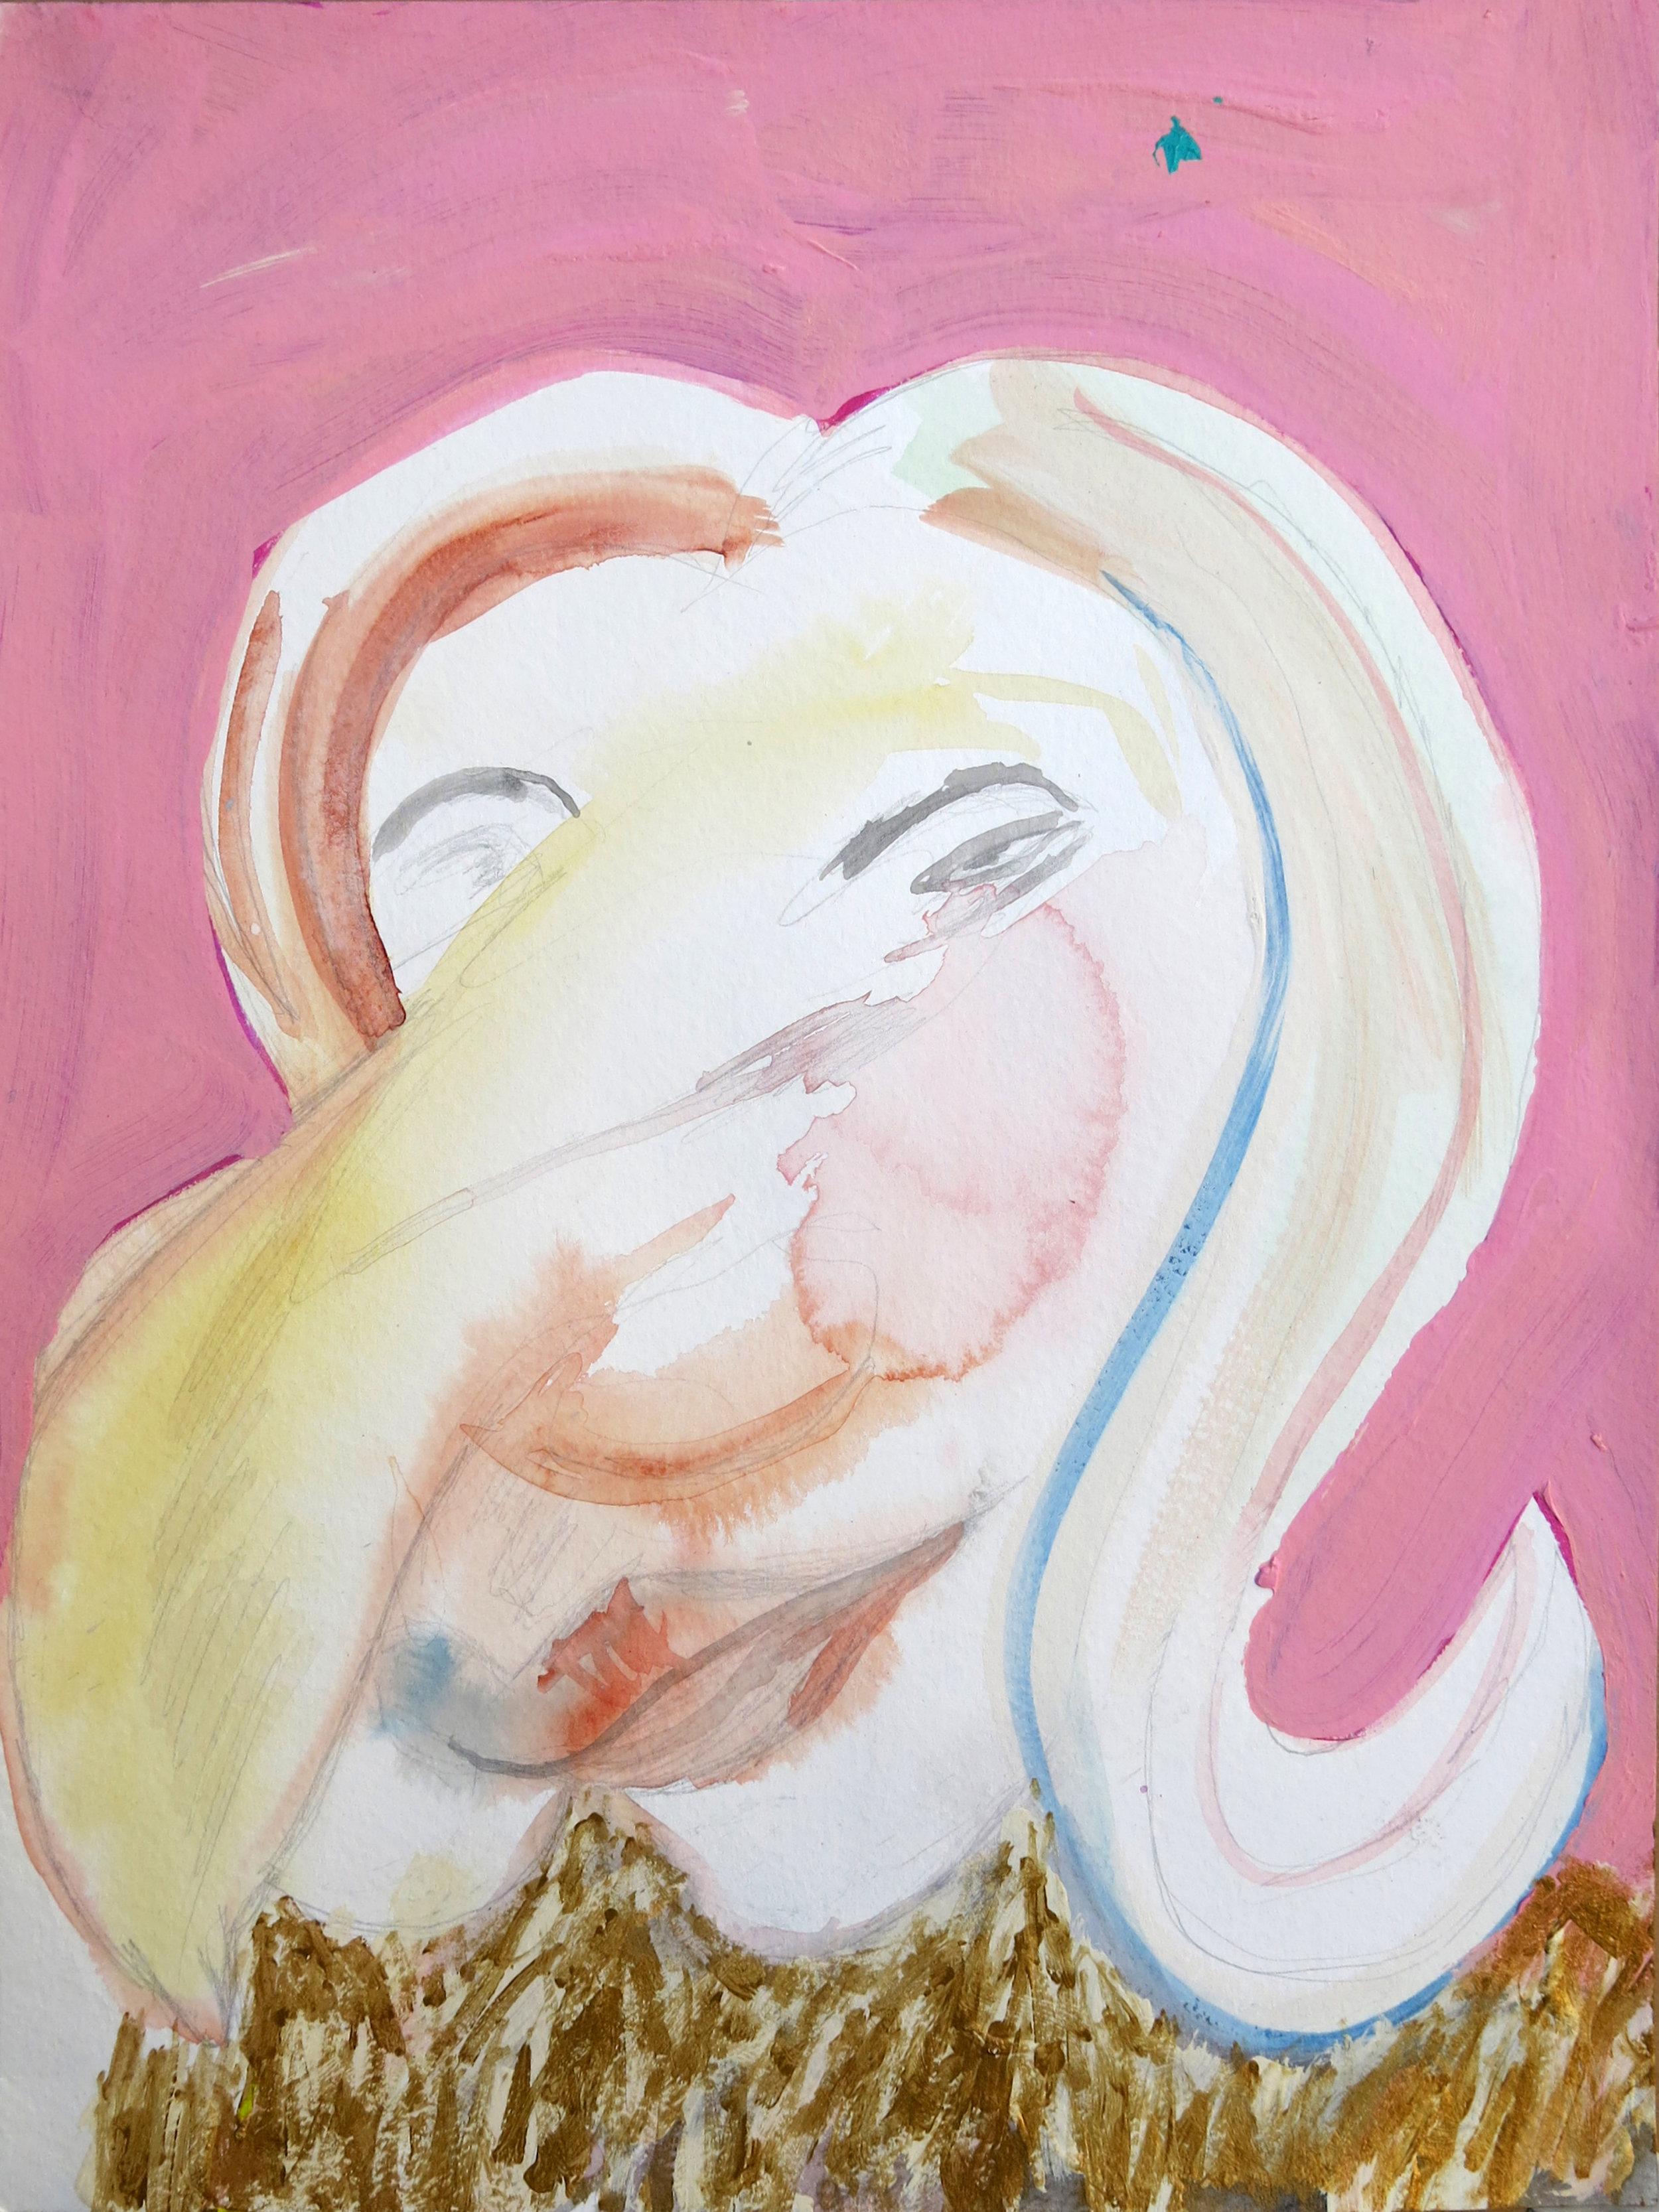 Barbra Streisand Portrait #16